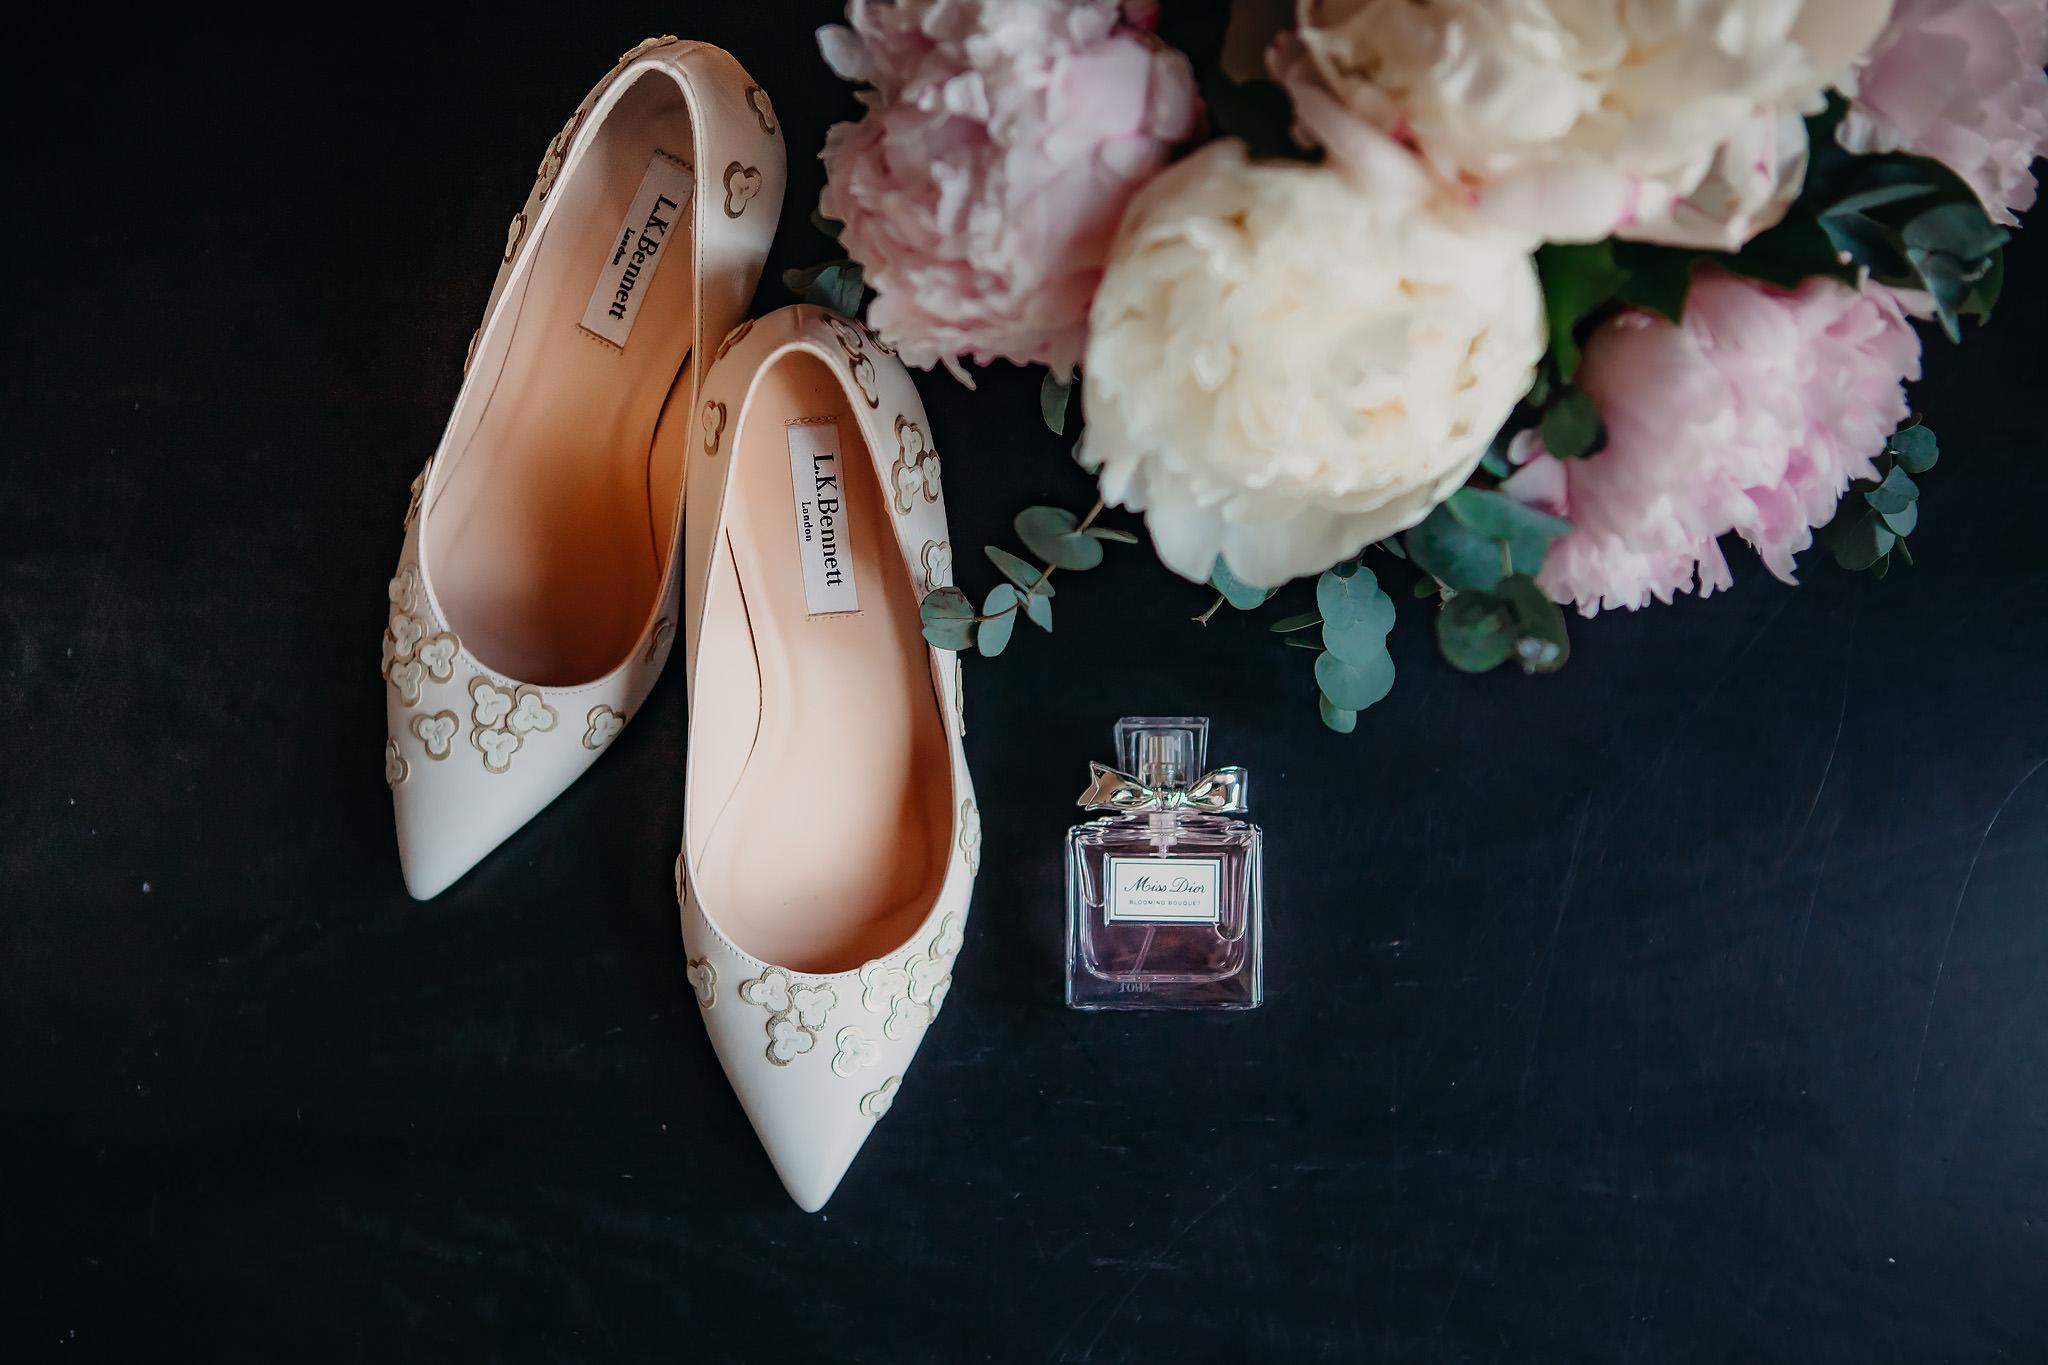 Bruidsreportage Bruidsfotografie Wedding Photographer 030 Bas Driessen Photography